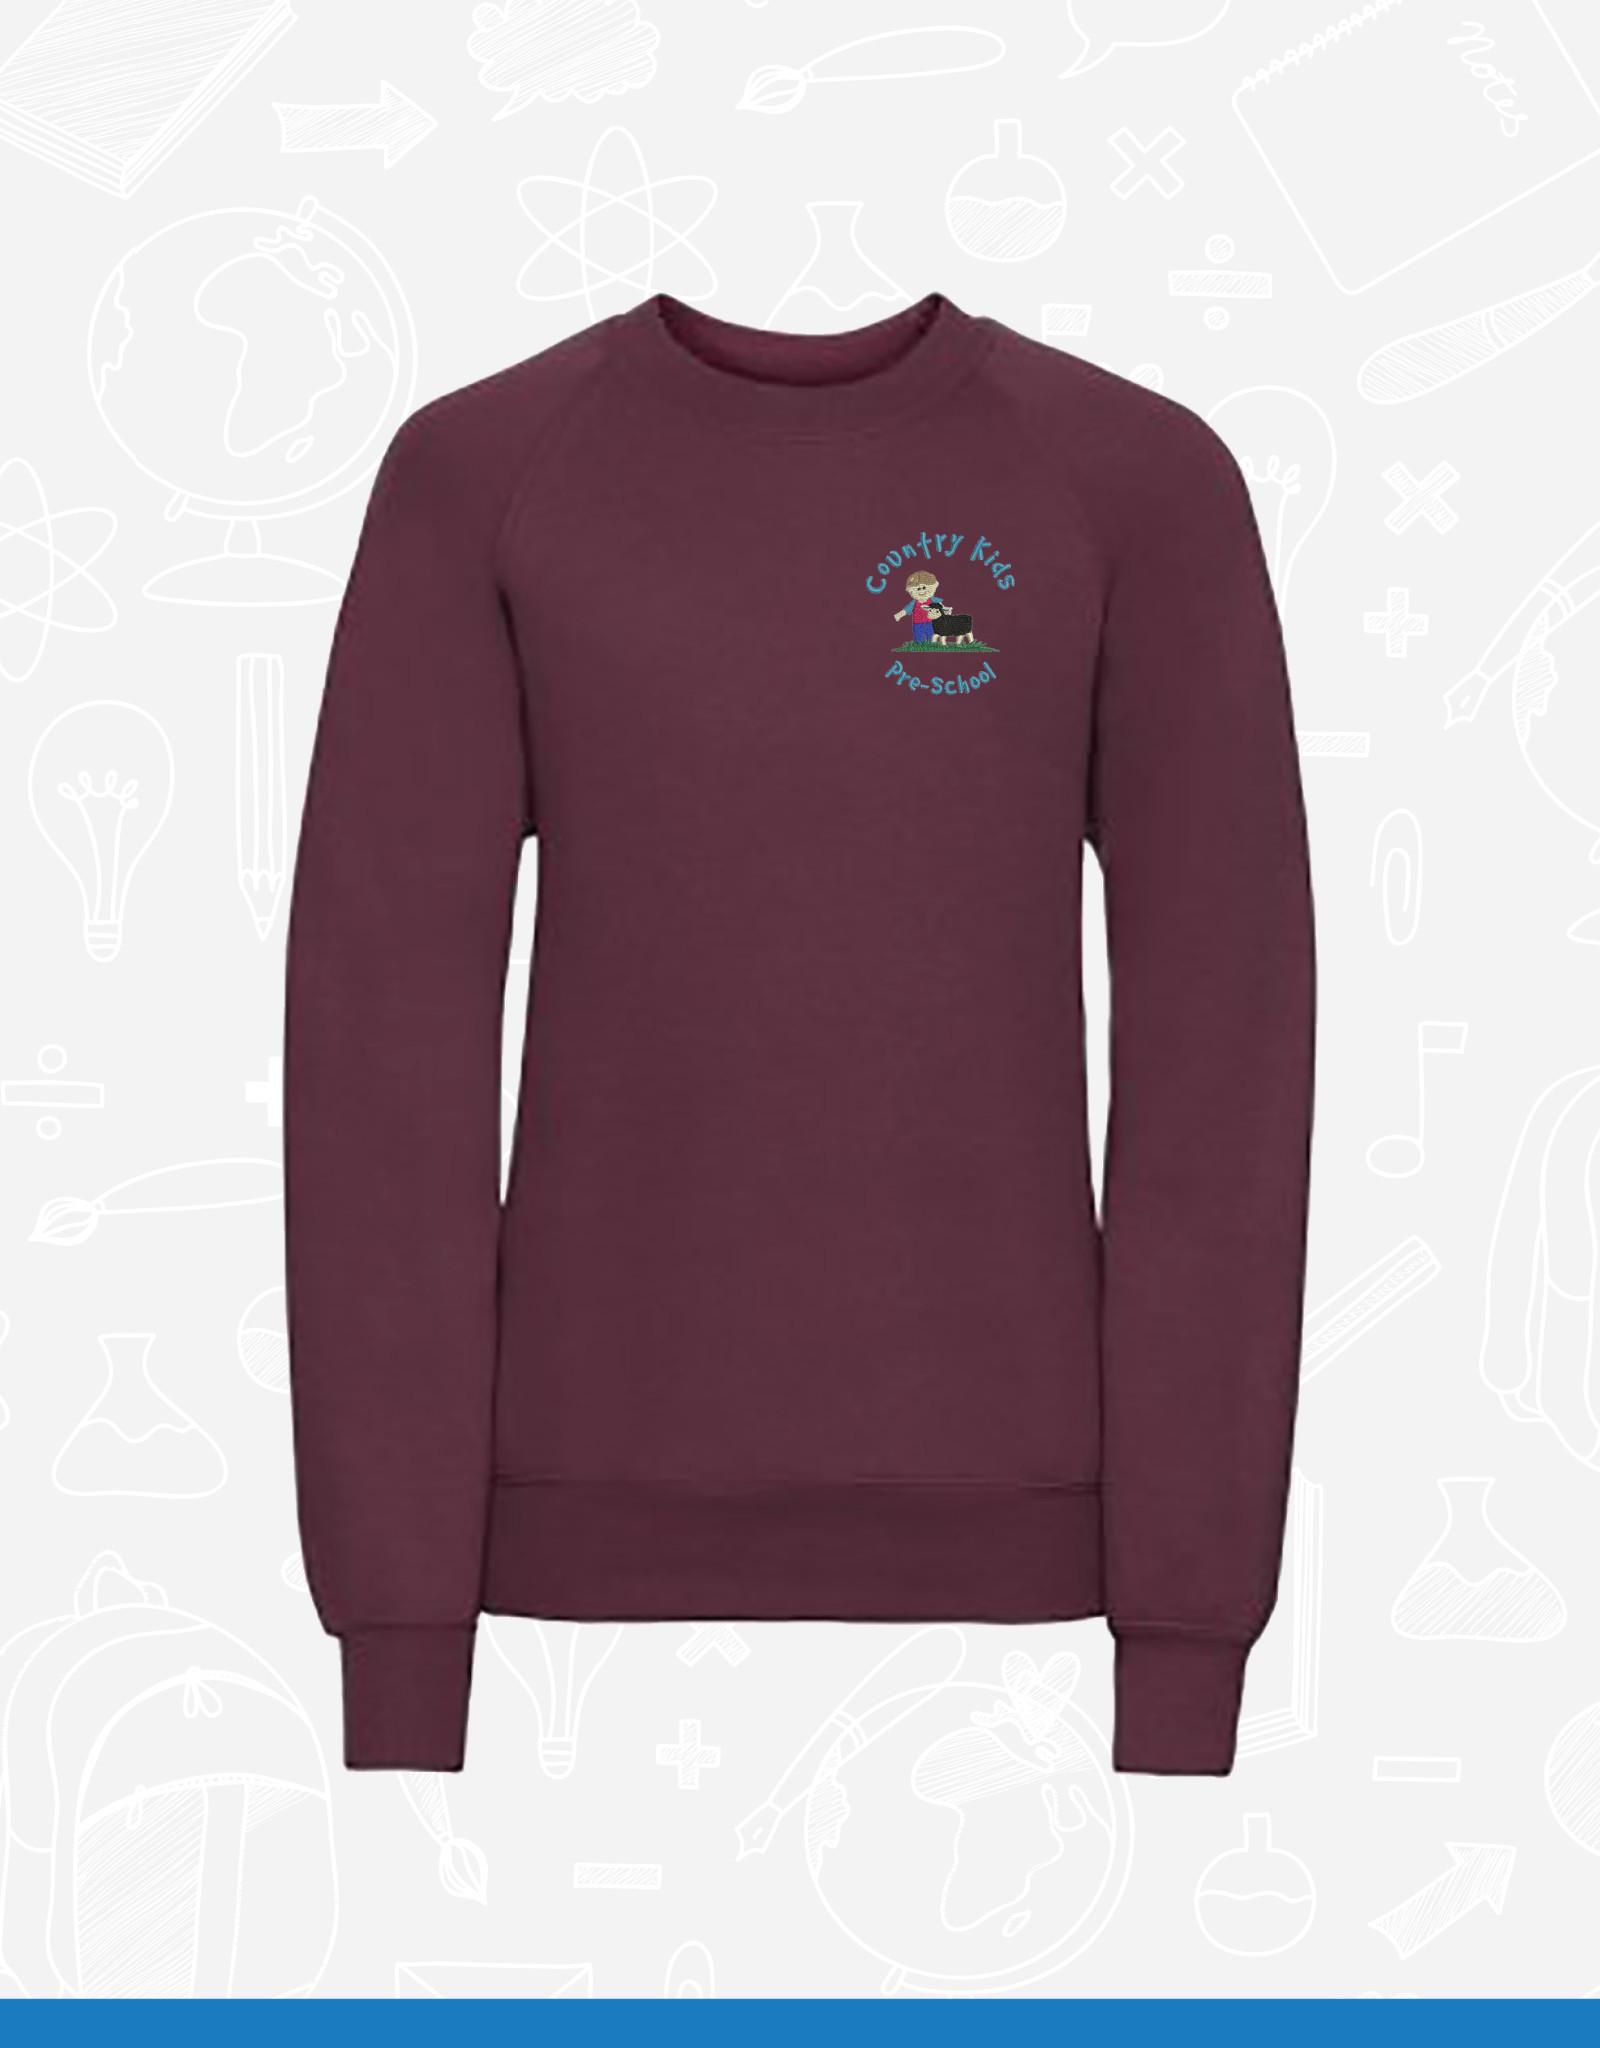 Jerzees Country Kids PreSchool Sweatshirt (762B)